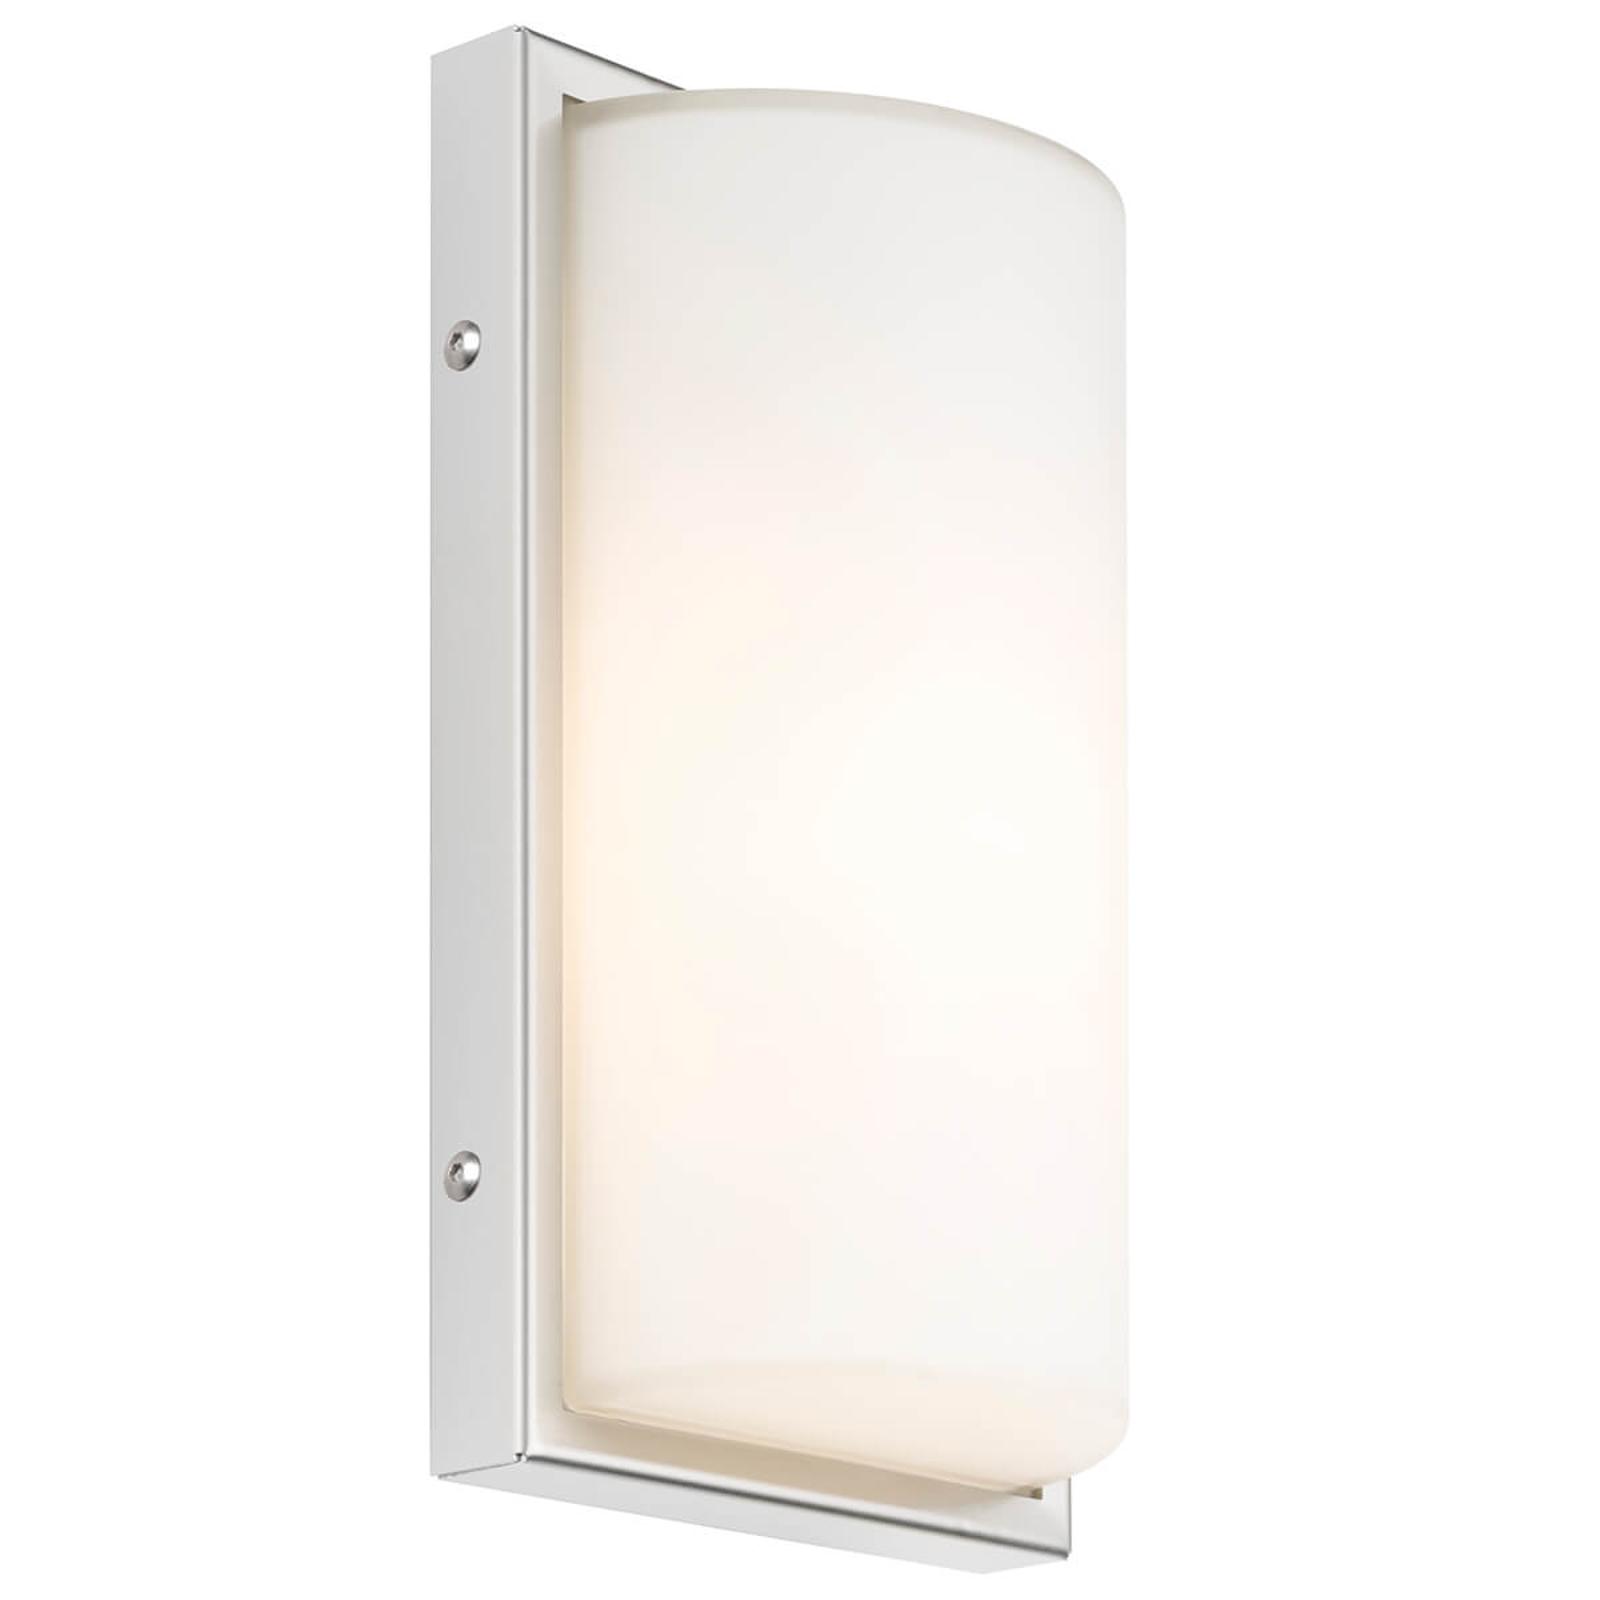 LED buitenwandlamp Mikka met sensor